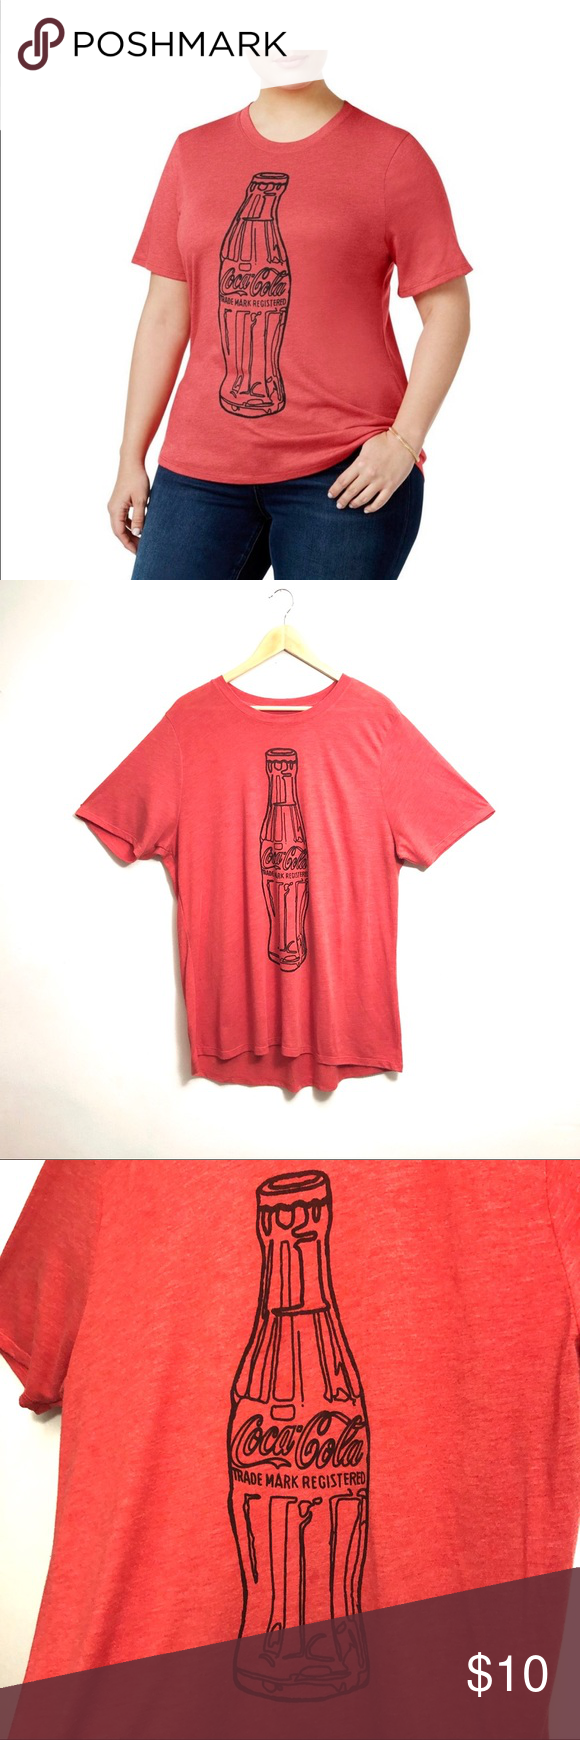 🛍 5/$25 Doe Coca Cola Graphic Short Sleeve Tee Doe   Coca Cola Graphic Short Sleeve T-Shirt. Size 2X...